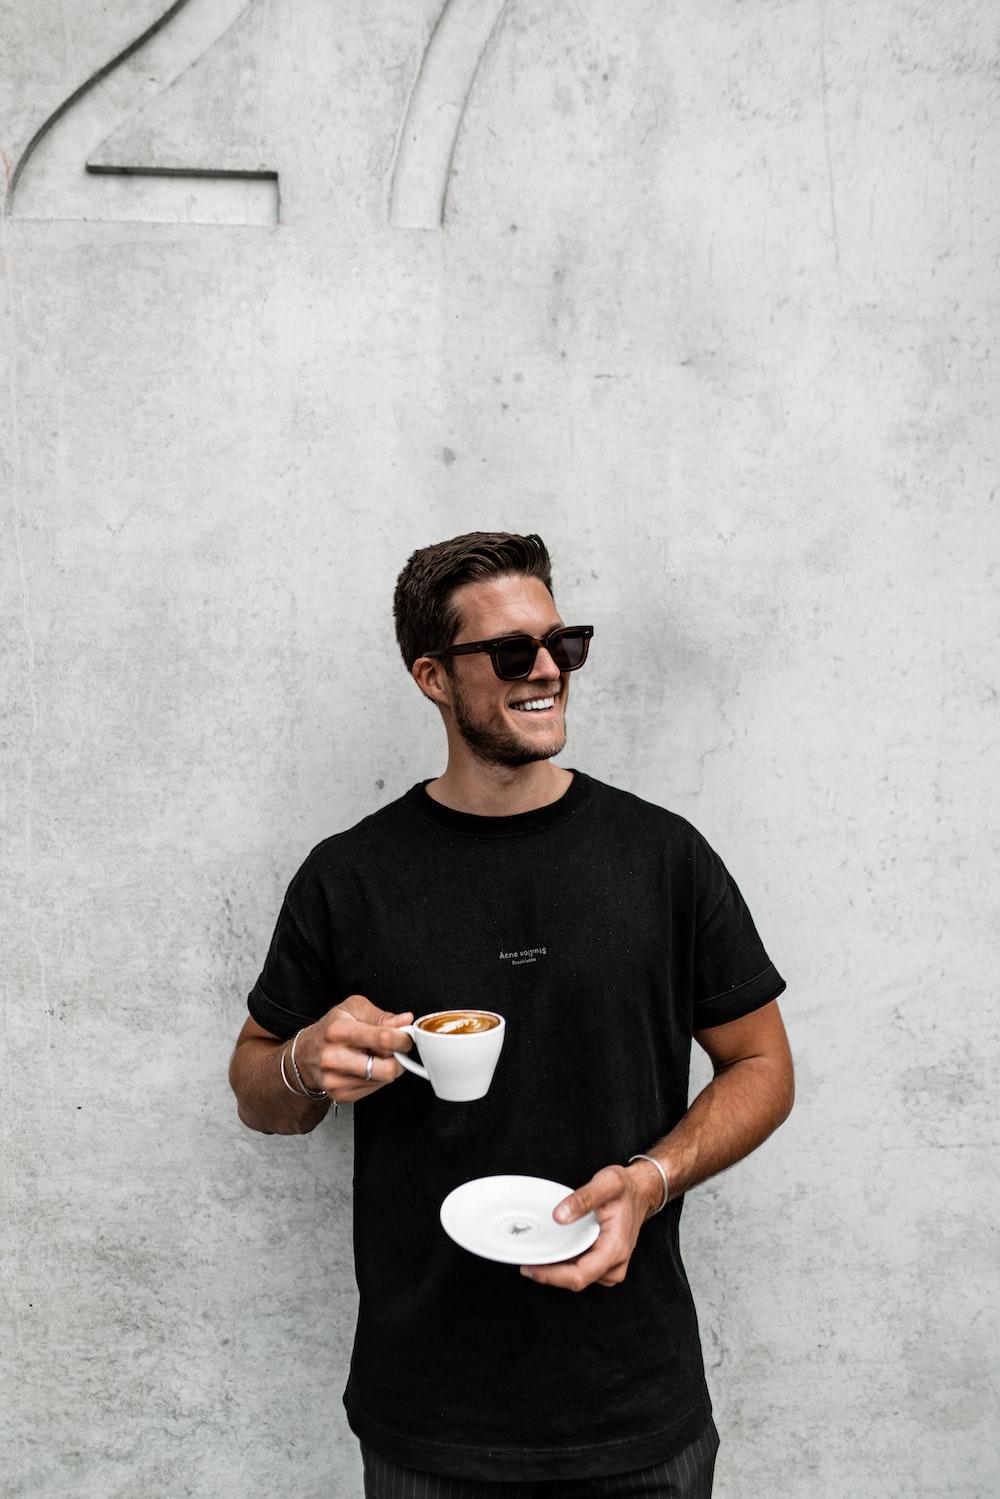 man in black crew neck t-shirt holding white ceramic mug